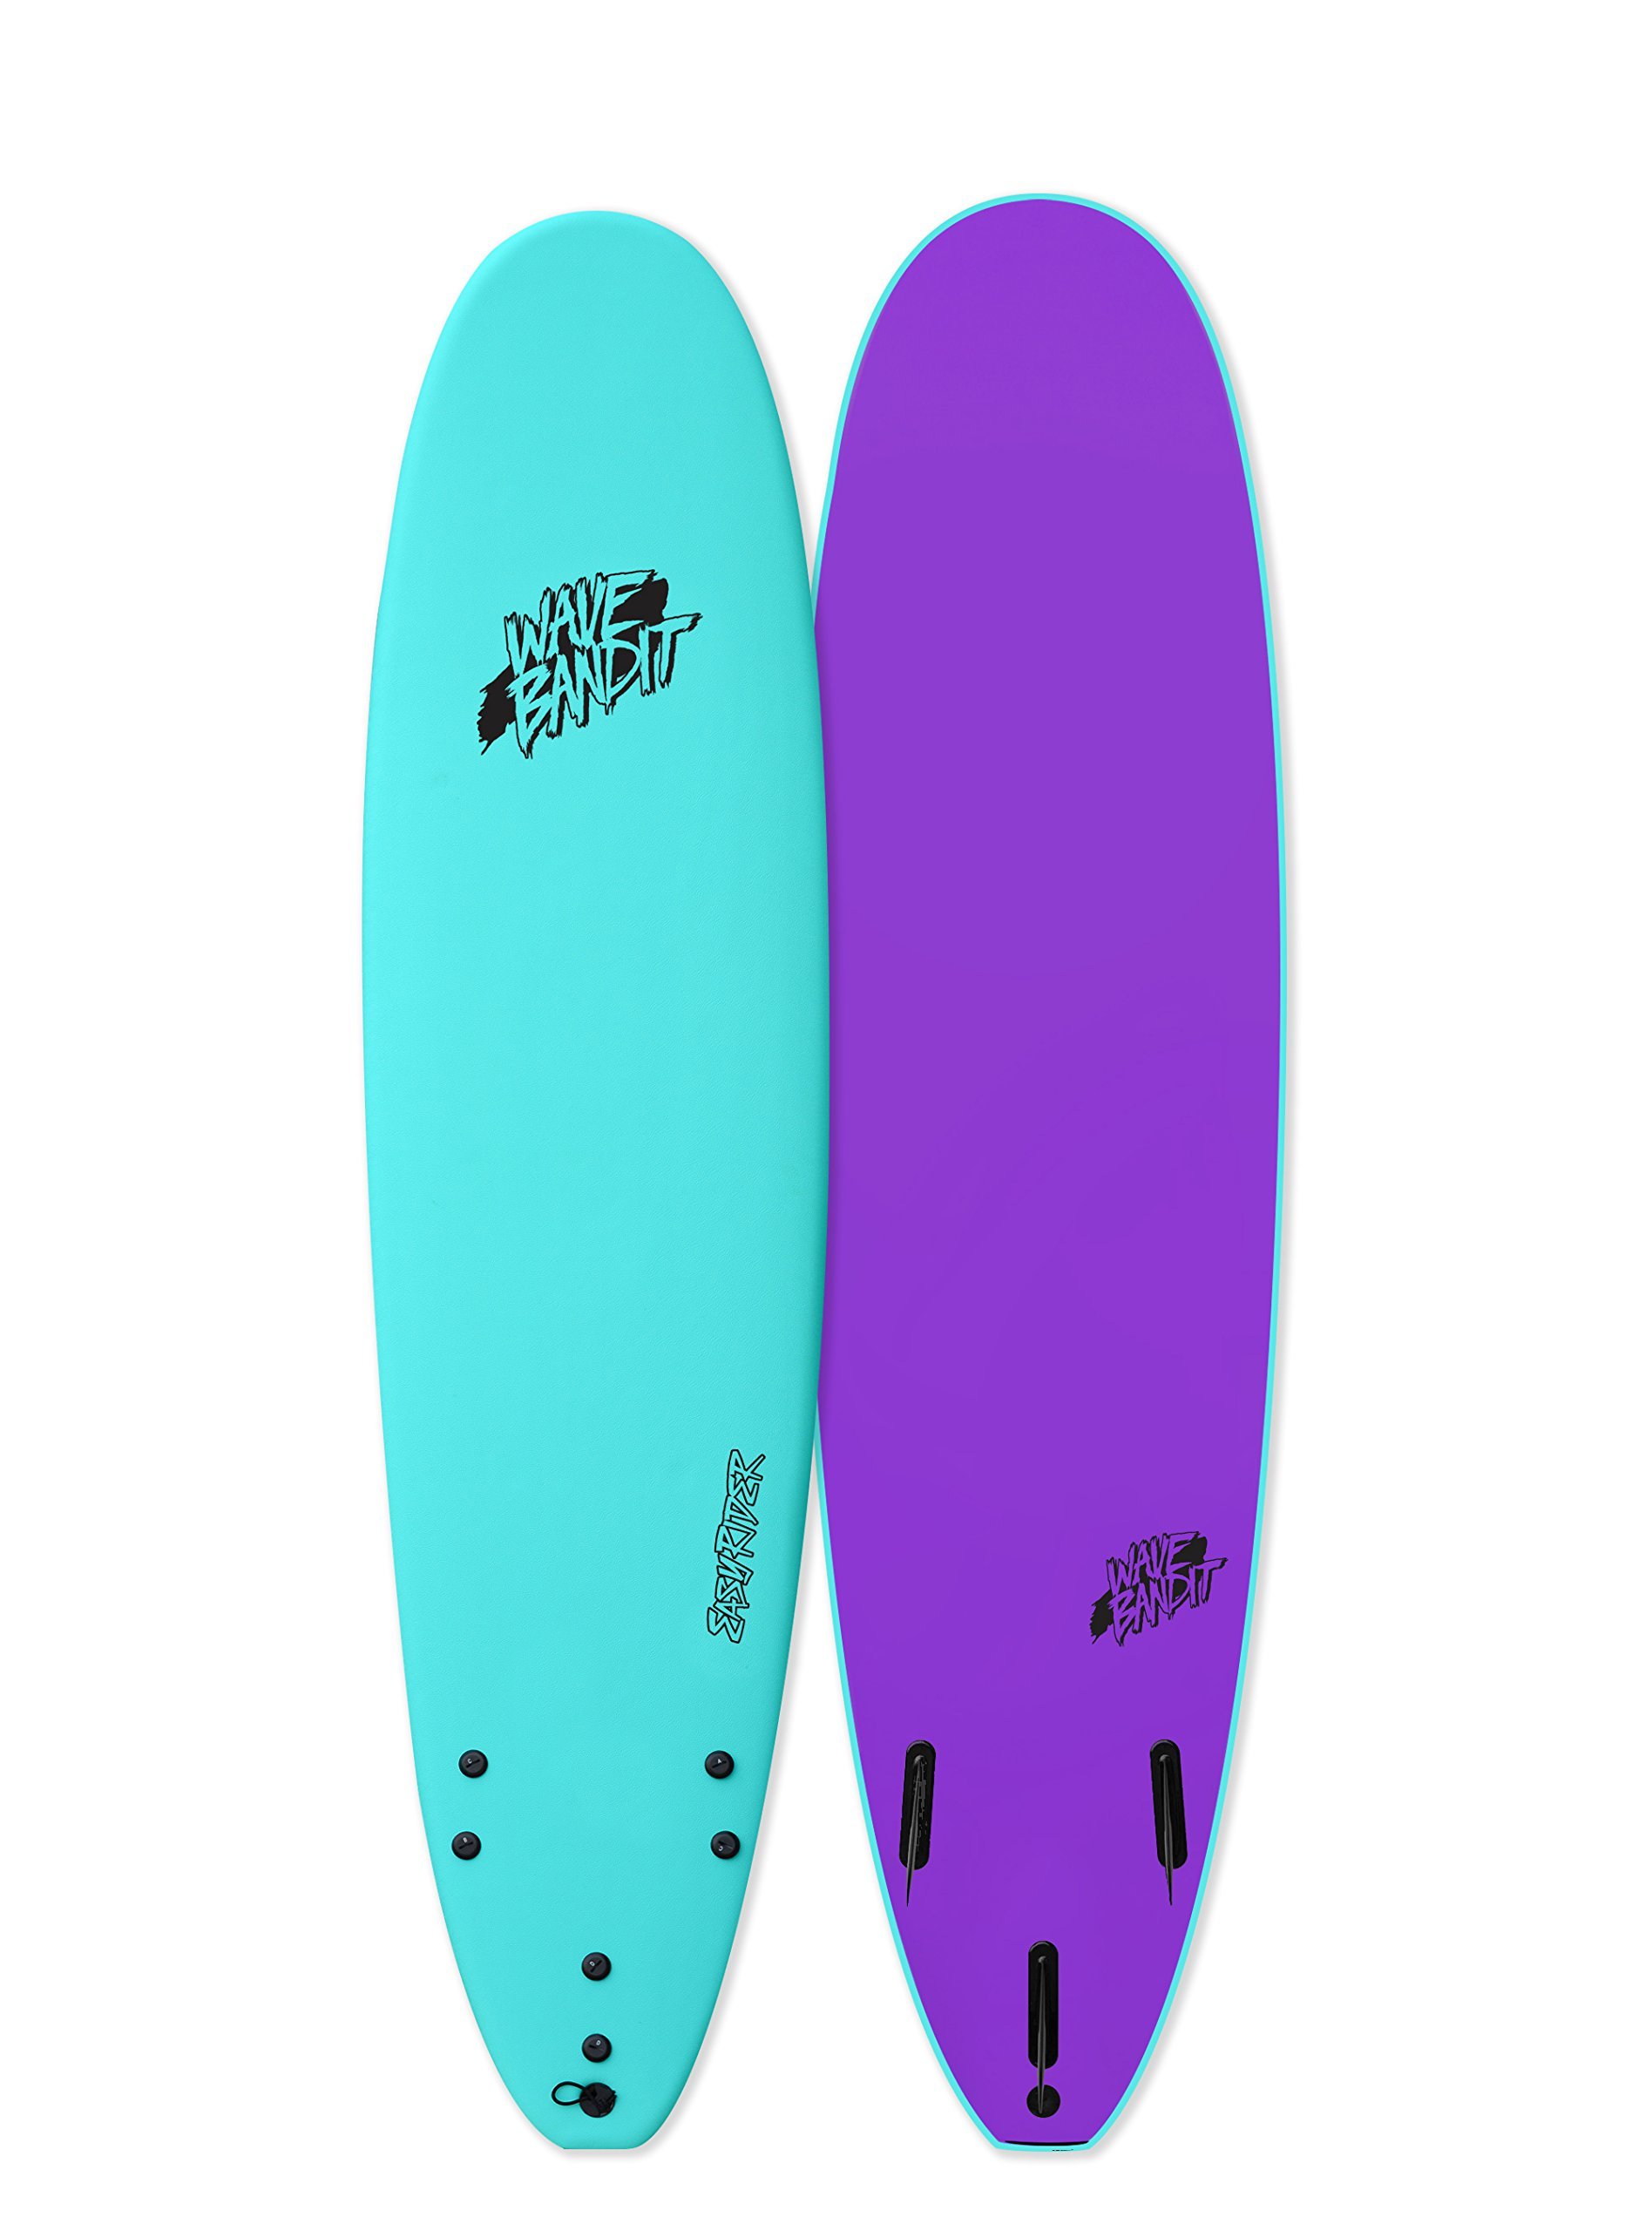 Wave Bandit EZ Rider Surfboard, Turquoise, 8' by Wave Bandit